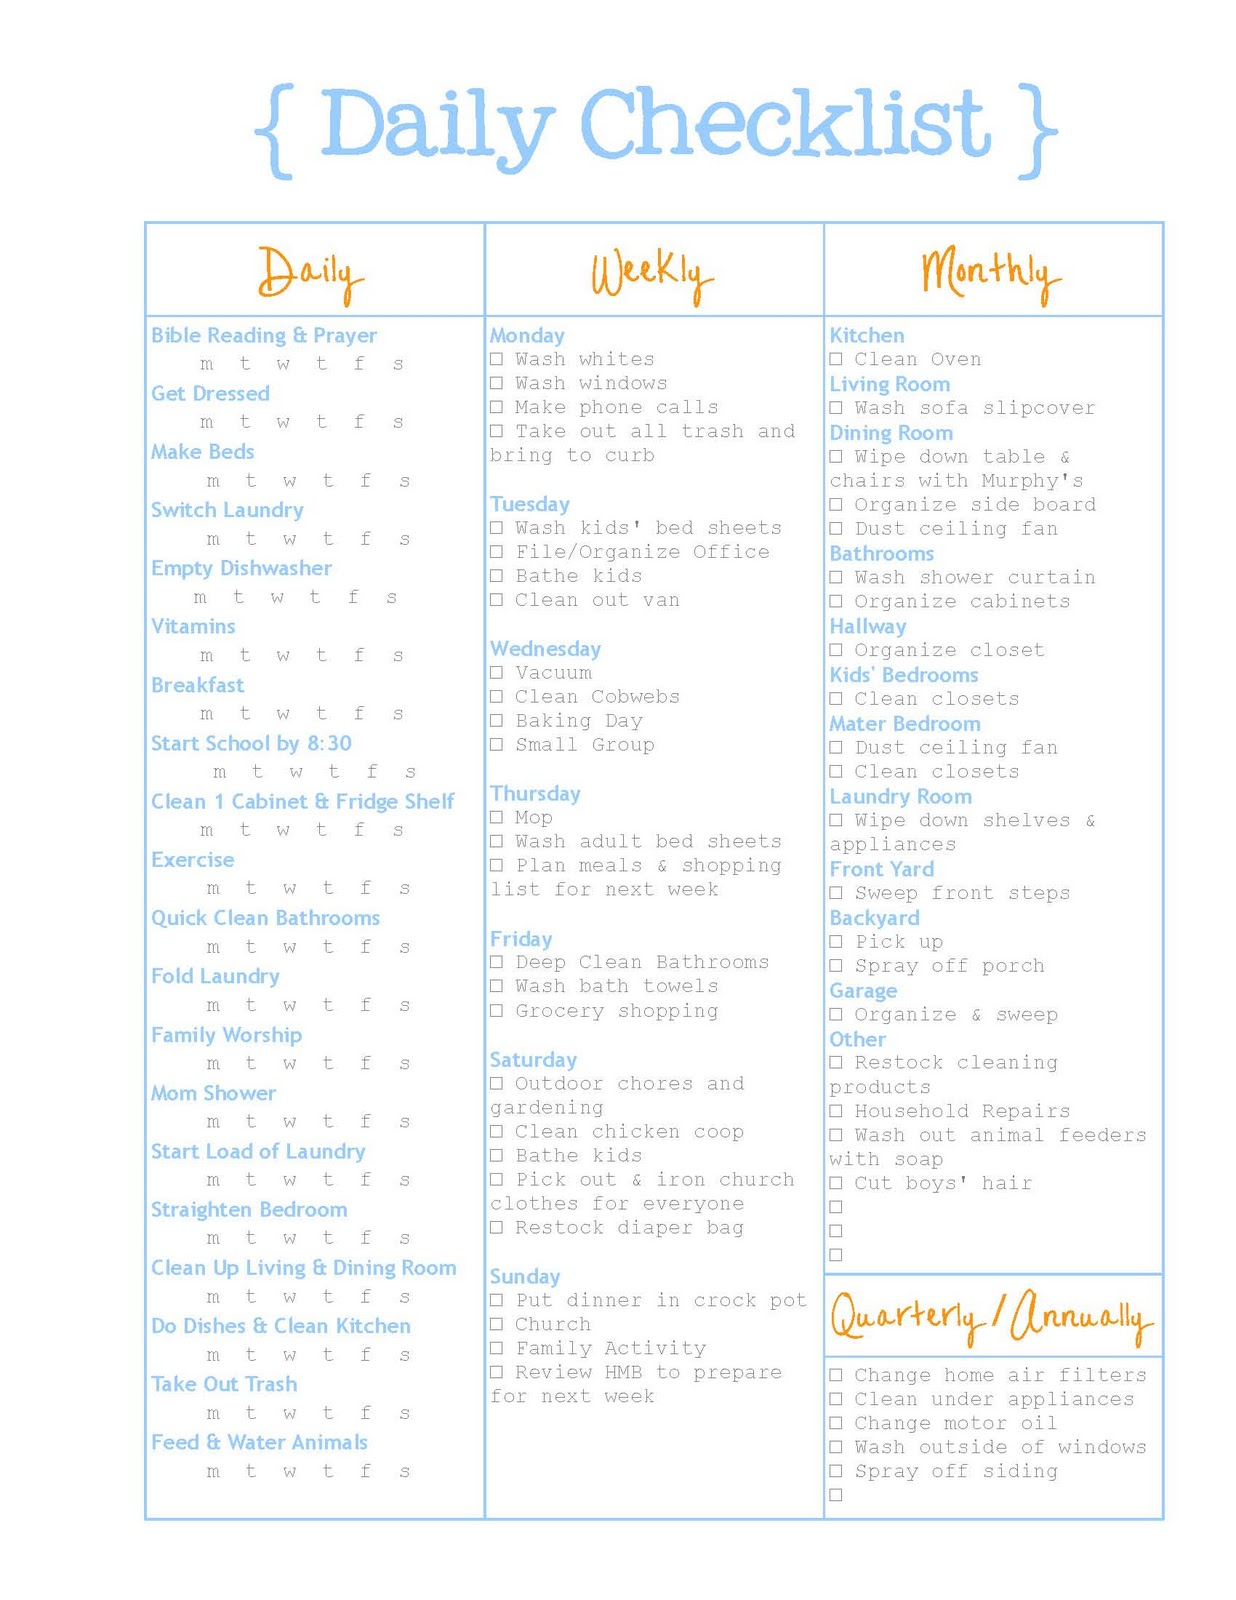 Daily Checklist For Frame Organizer